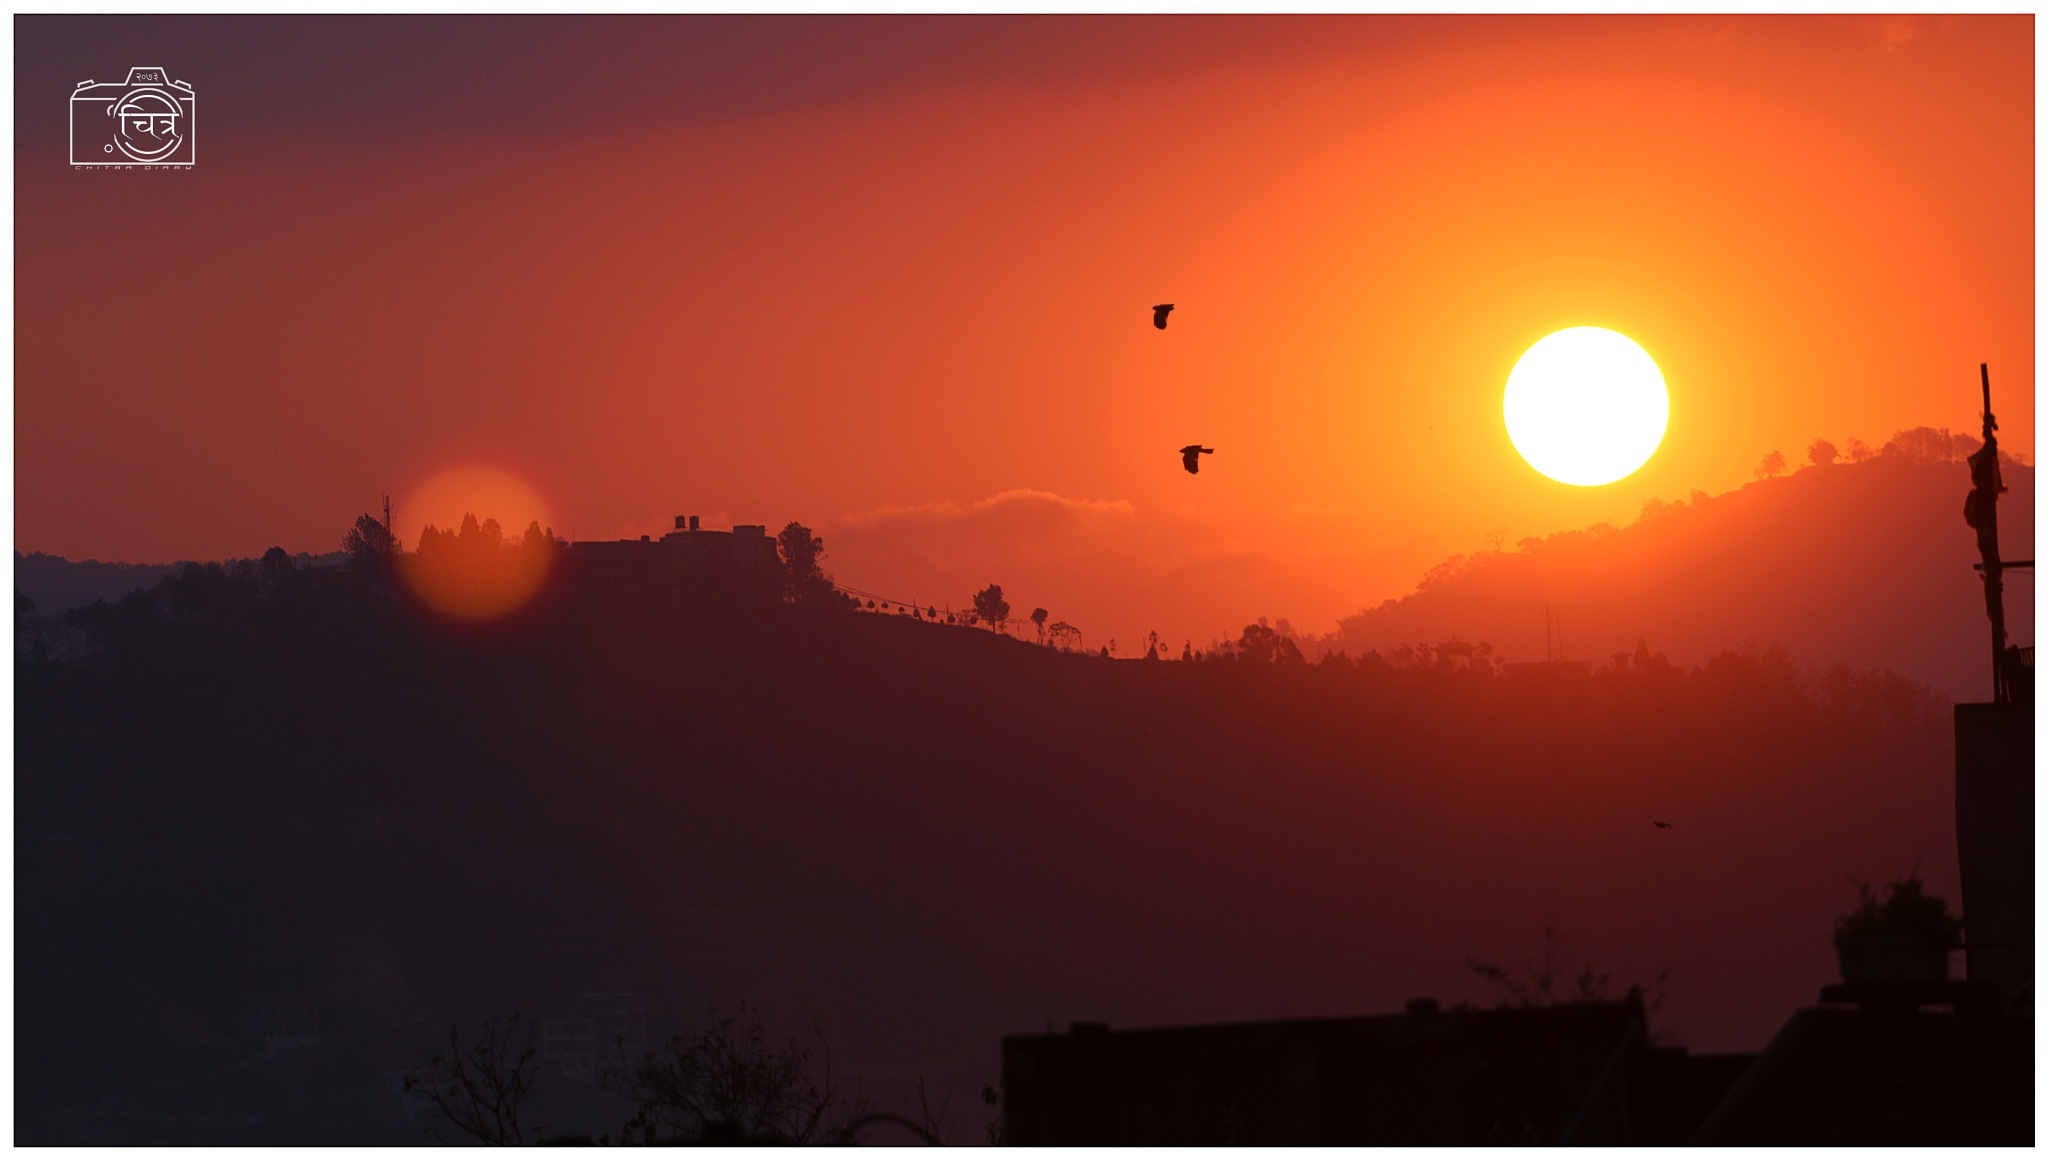 Good Morning by Meghawee Shakya